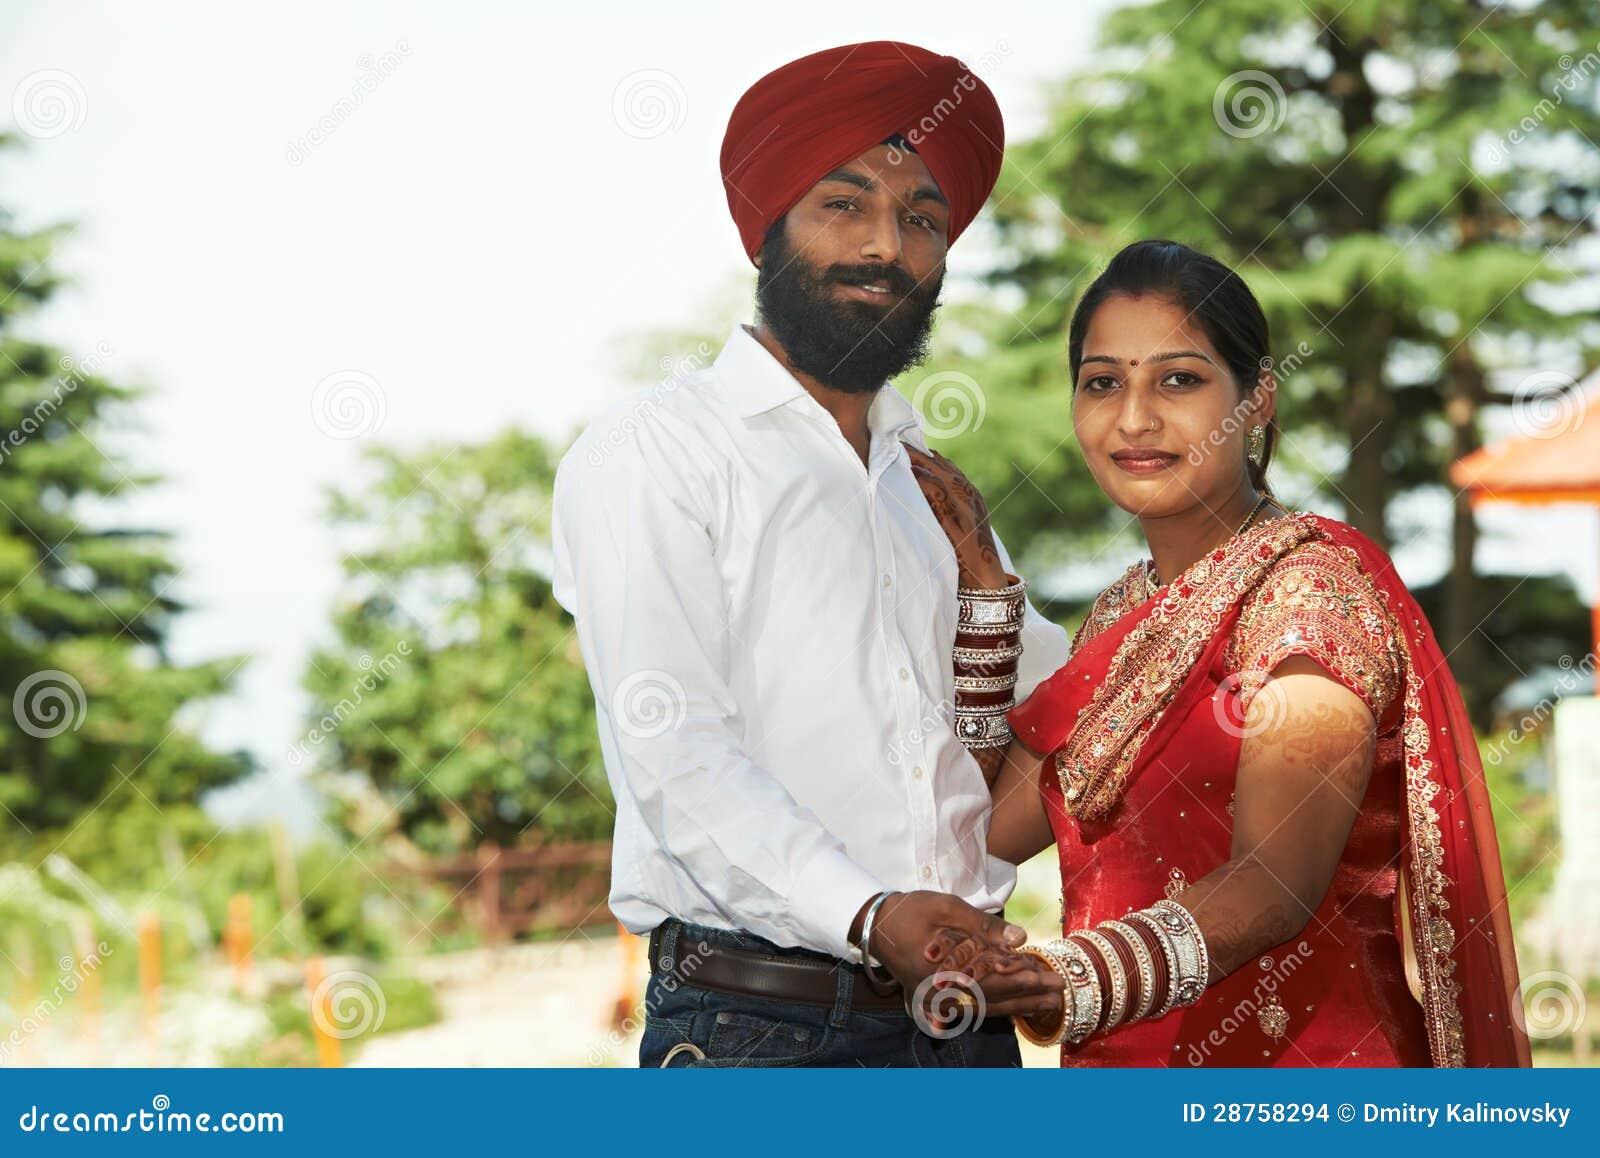 bonita hindu singles Play next play now dil samundar garam masala (hd) full video song-john abraham akshay kumar hindi movie hot sexy.